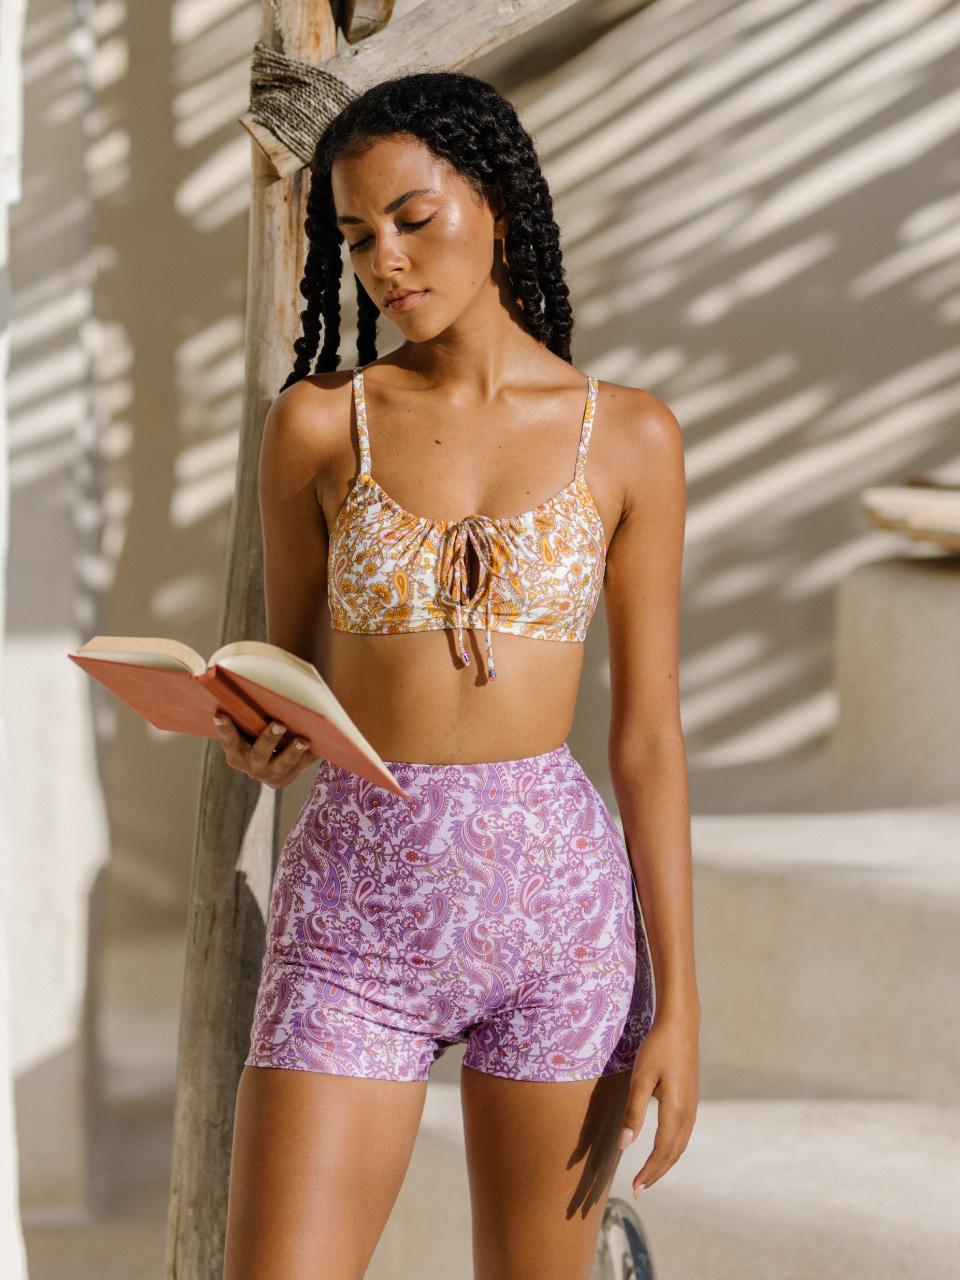 MANDANA HIGH SHORTSswimwear,수영복,비키니,데이즈데이즈,dazedayz,디자이너수영복,디자이너스위웨어,디자이너수영복,리조트웨어,